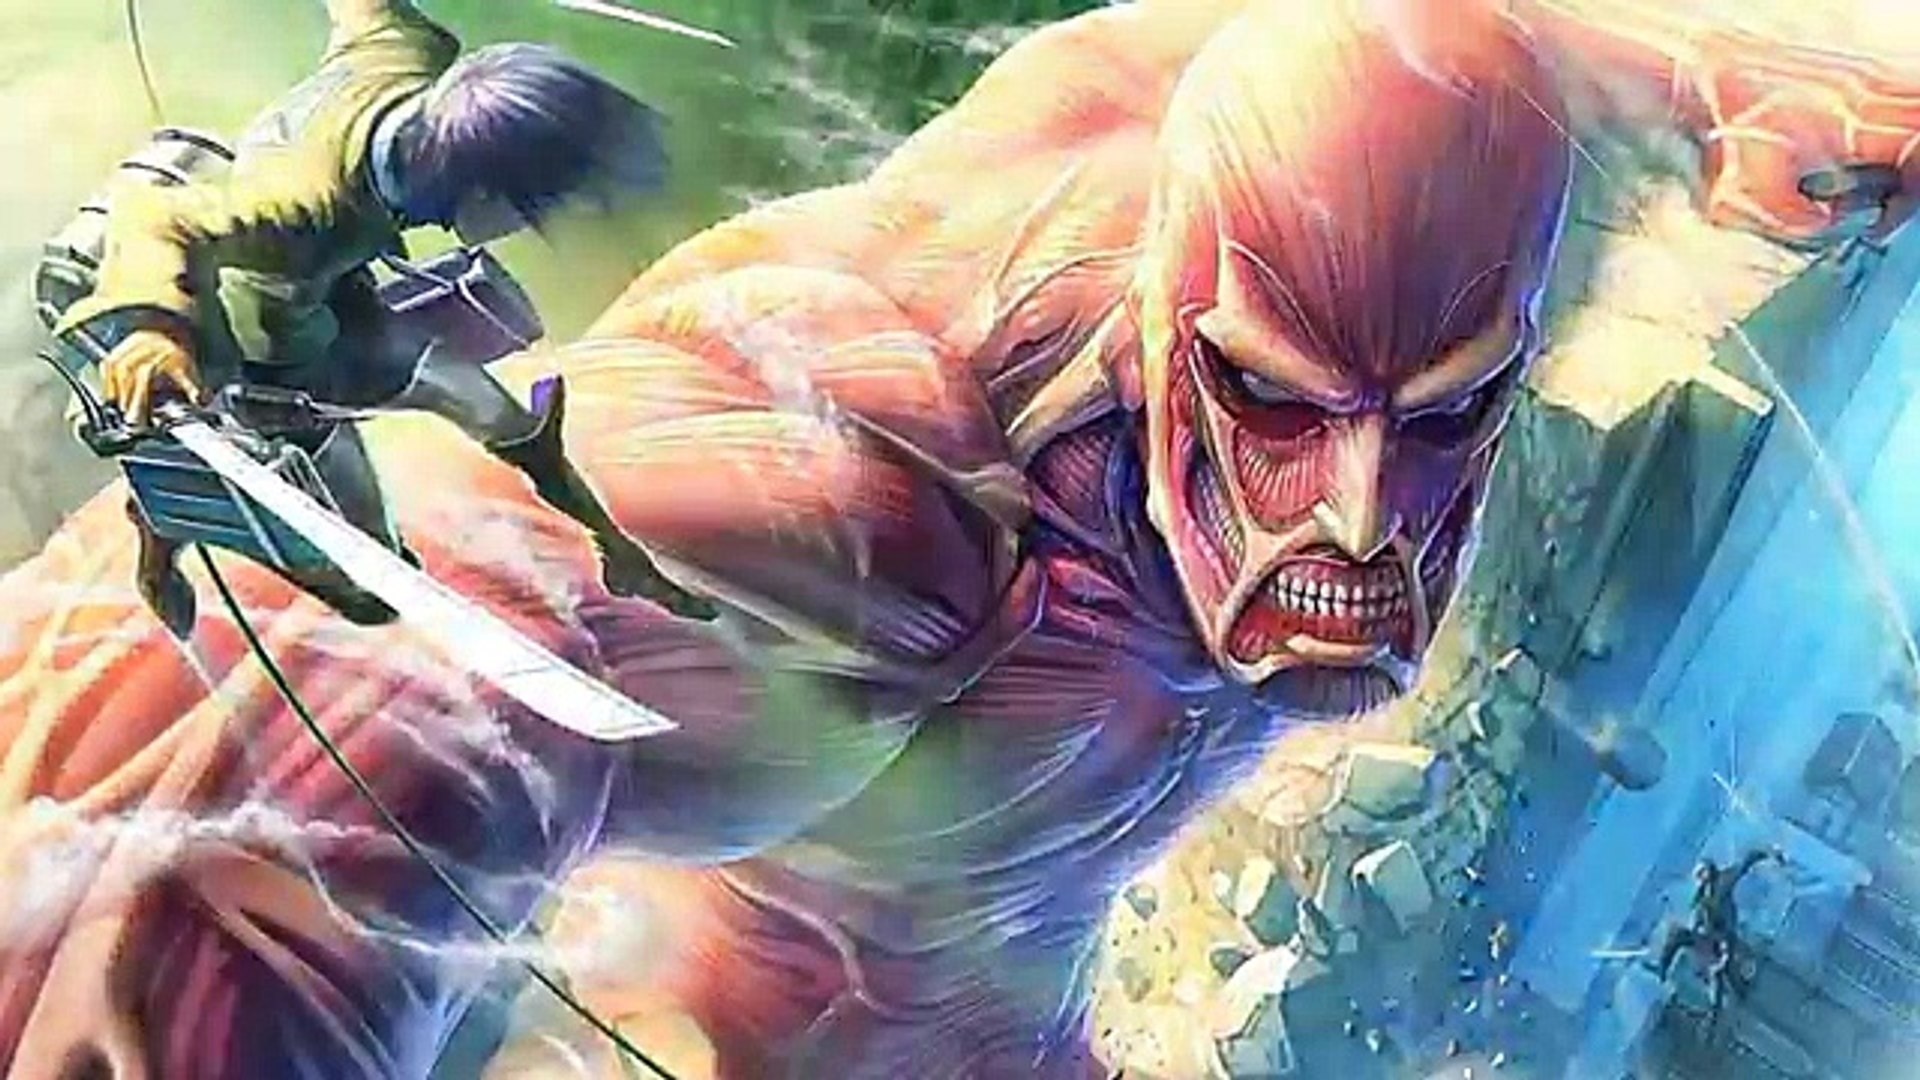 Full Color Eren Armin Vs Colossal Titan Full Fight Attack On Titan Manga Chapter 82 Video Dailymotion